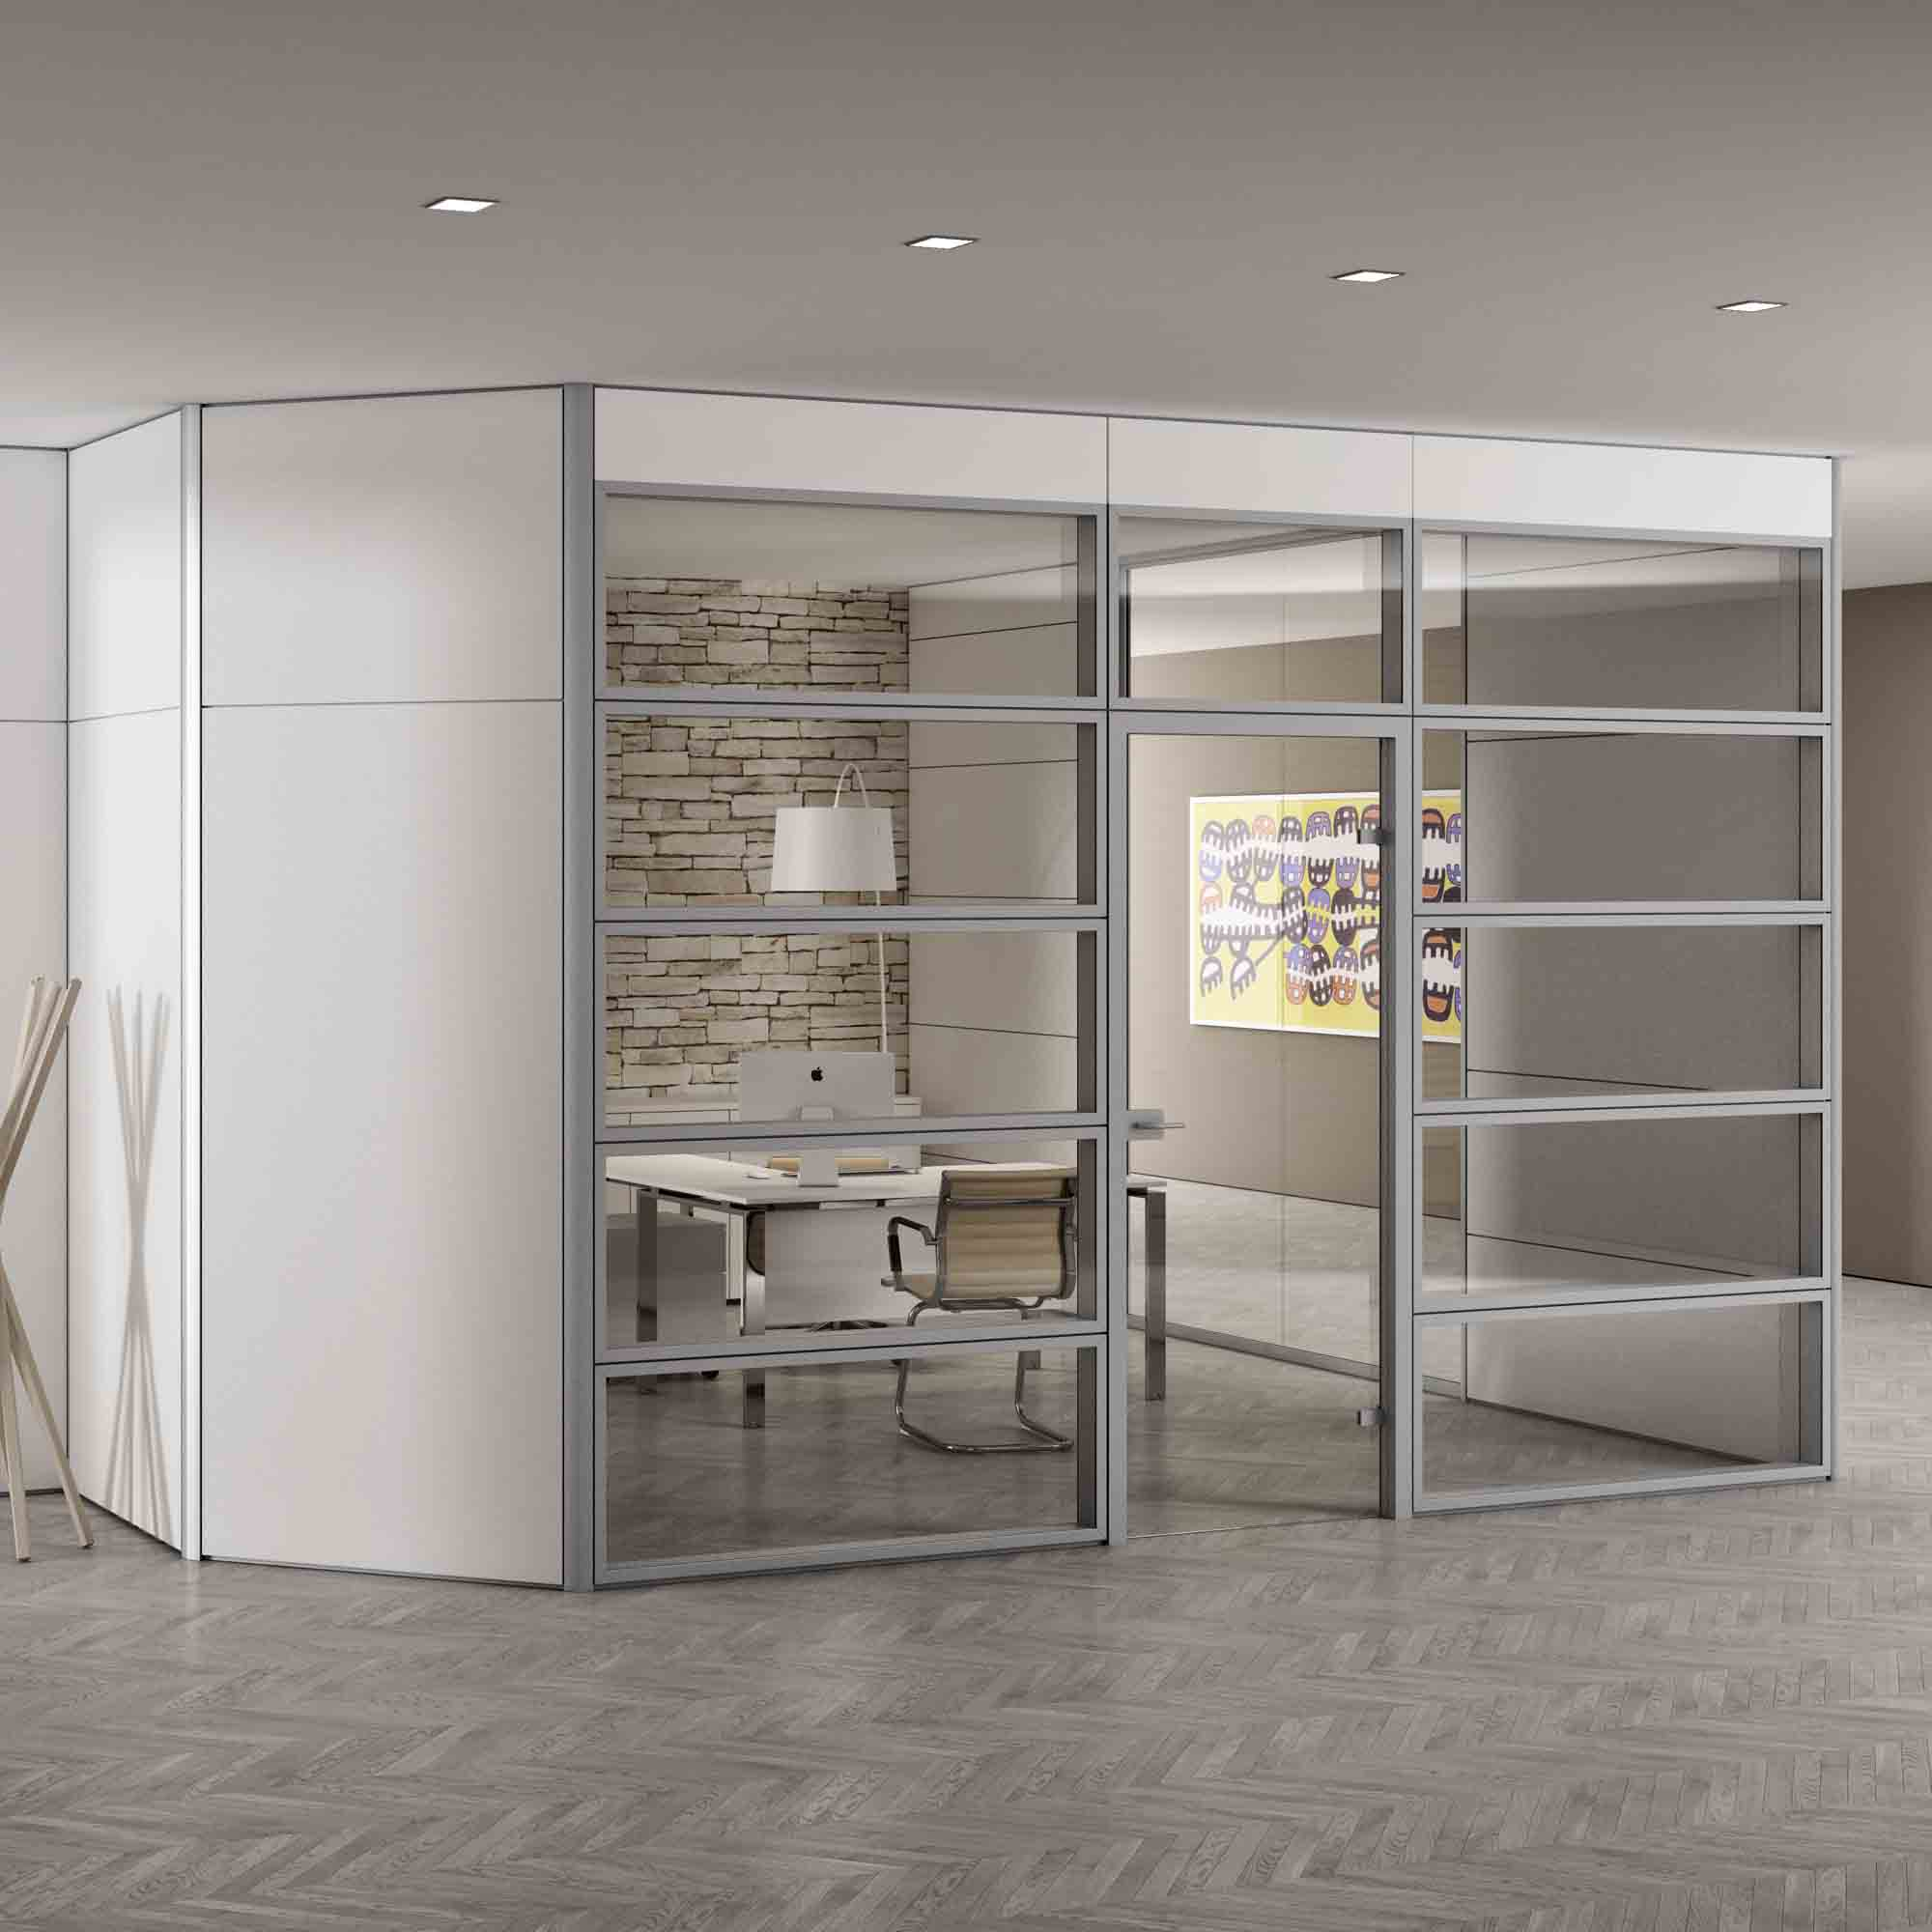 Divisori mobili per interni mx47 pineglen for Mobili per interni